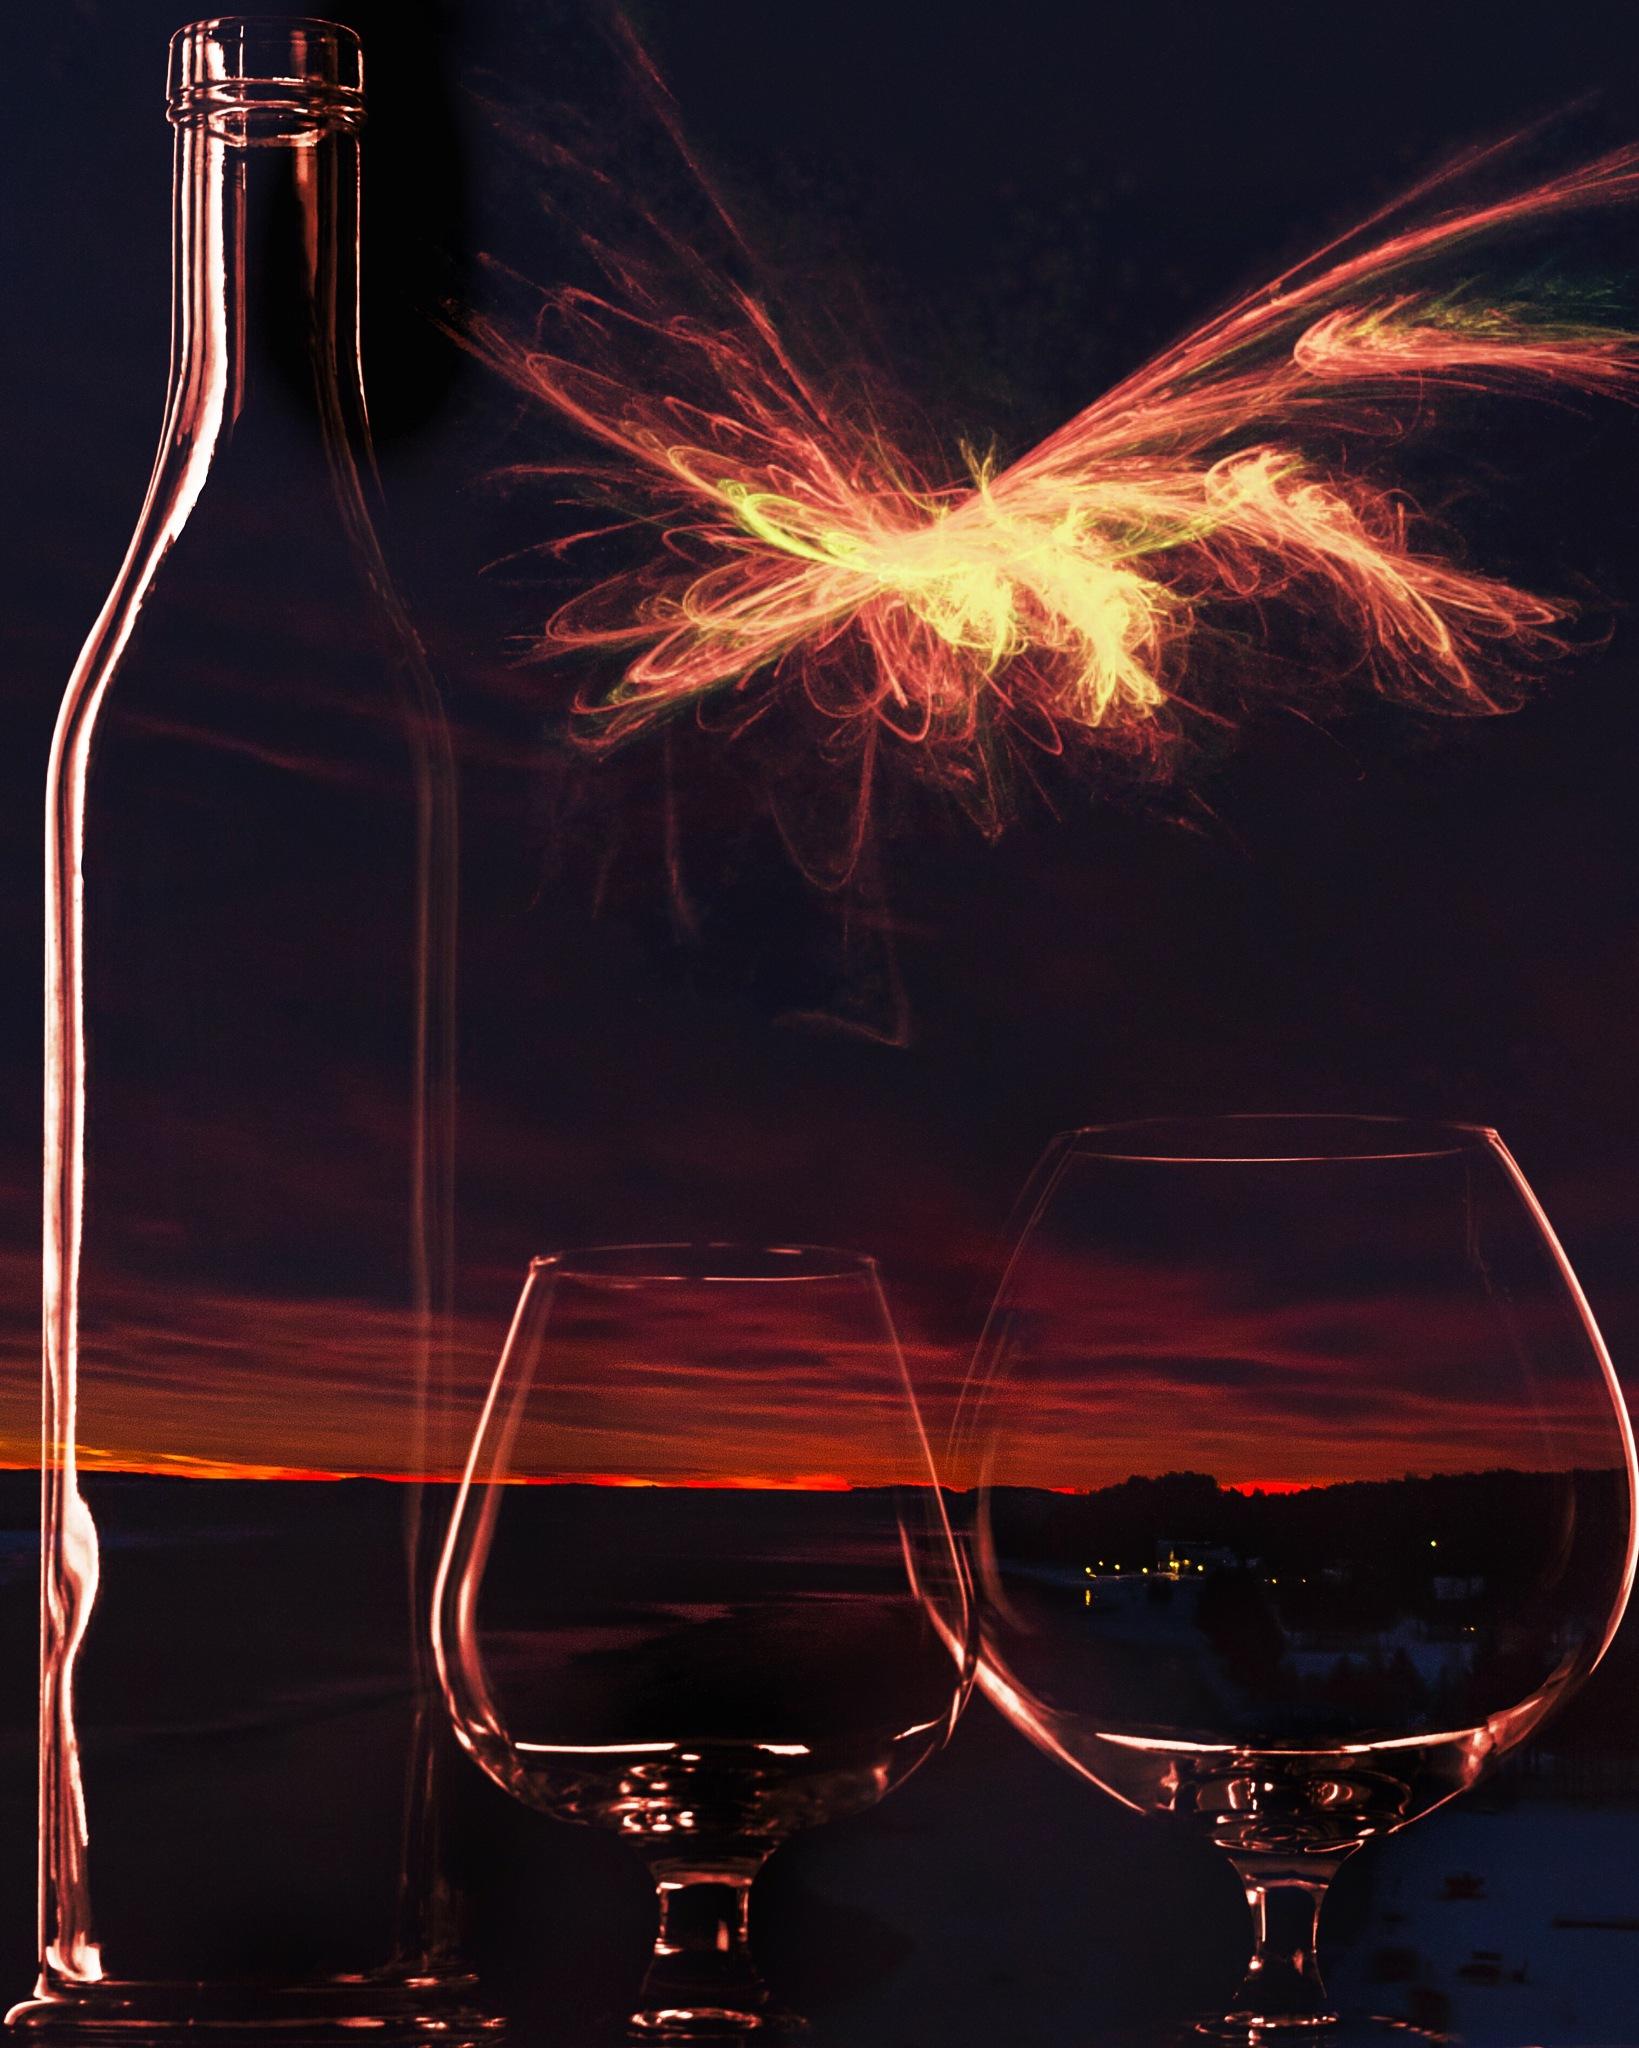 Burgundy sunrise by katarina.wikberg.3